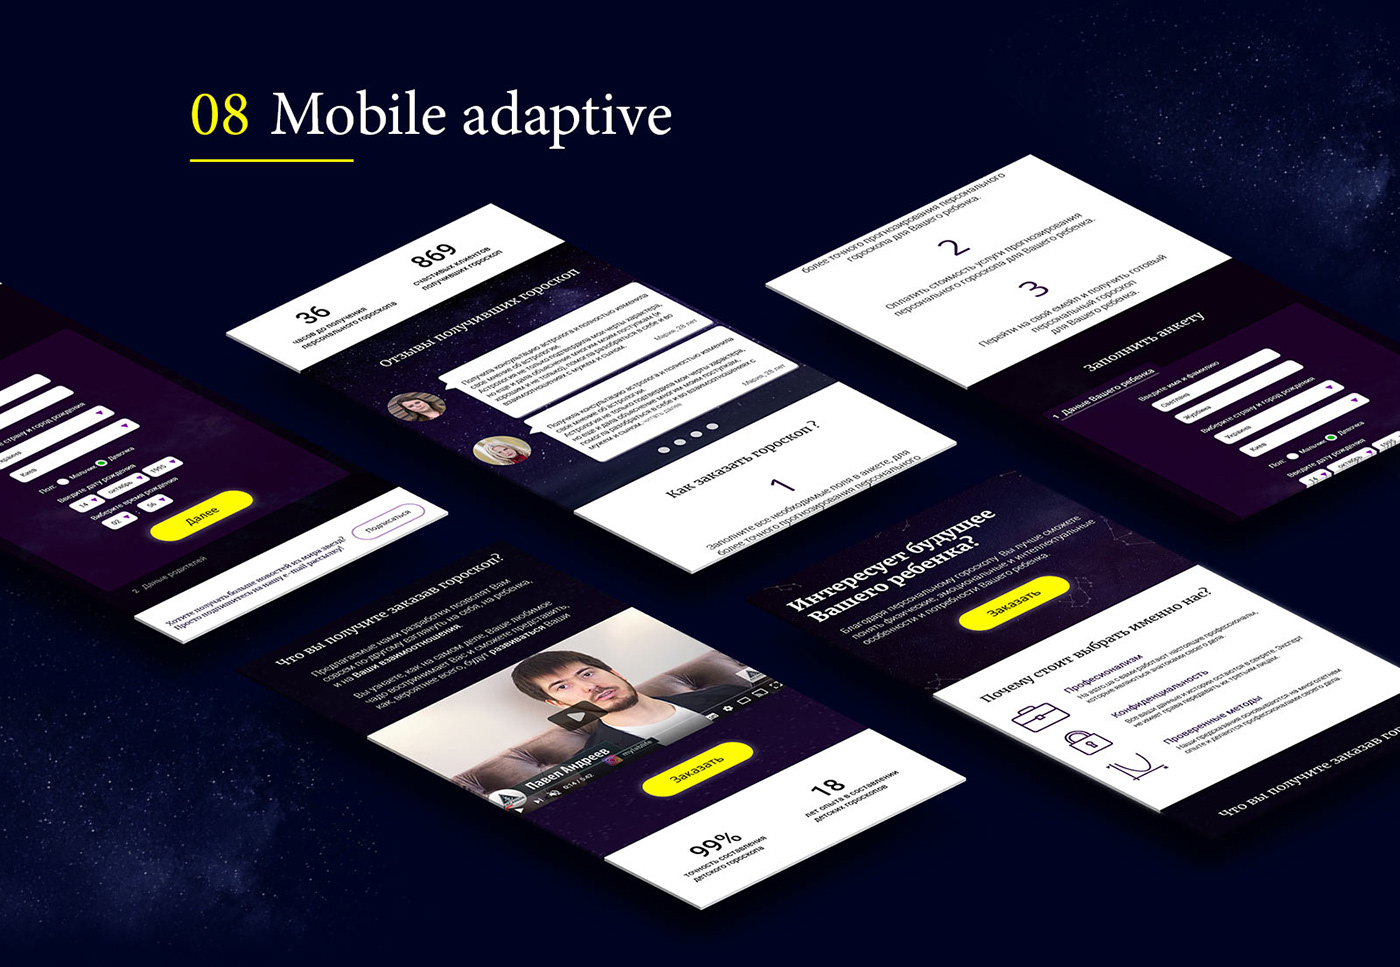 Horoscope landing page adaptive design moon Desktope home page design children site magik